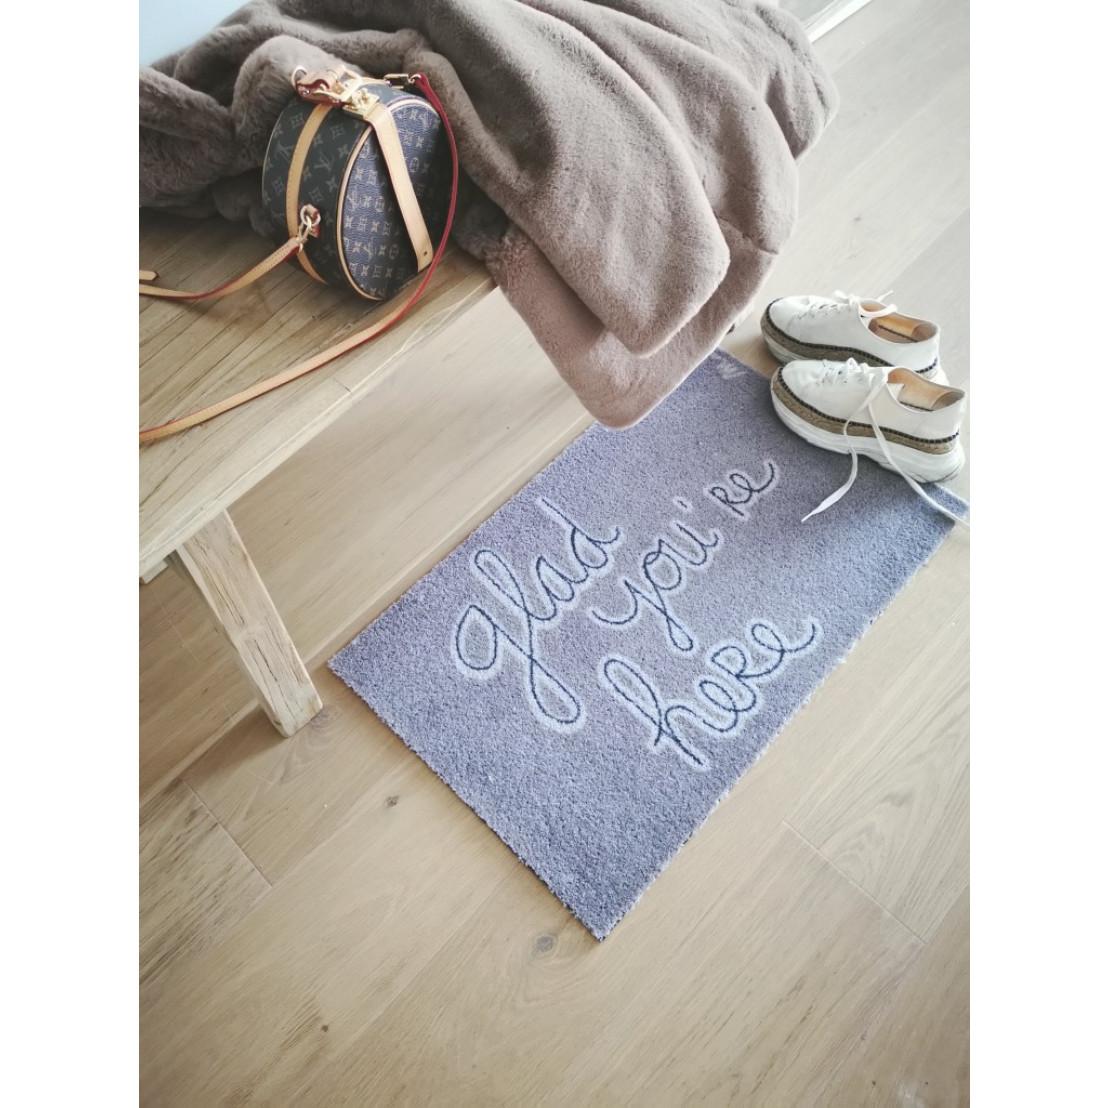 Fußmatte Audrey Scraper 50 x 75 cm